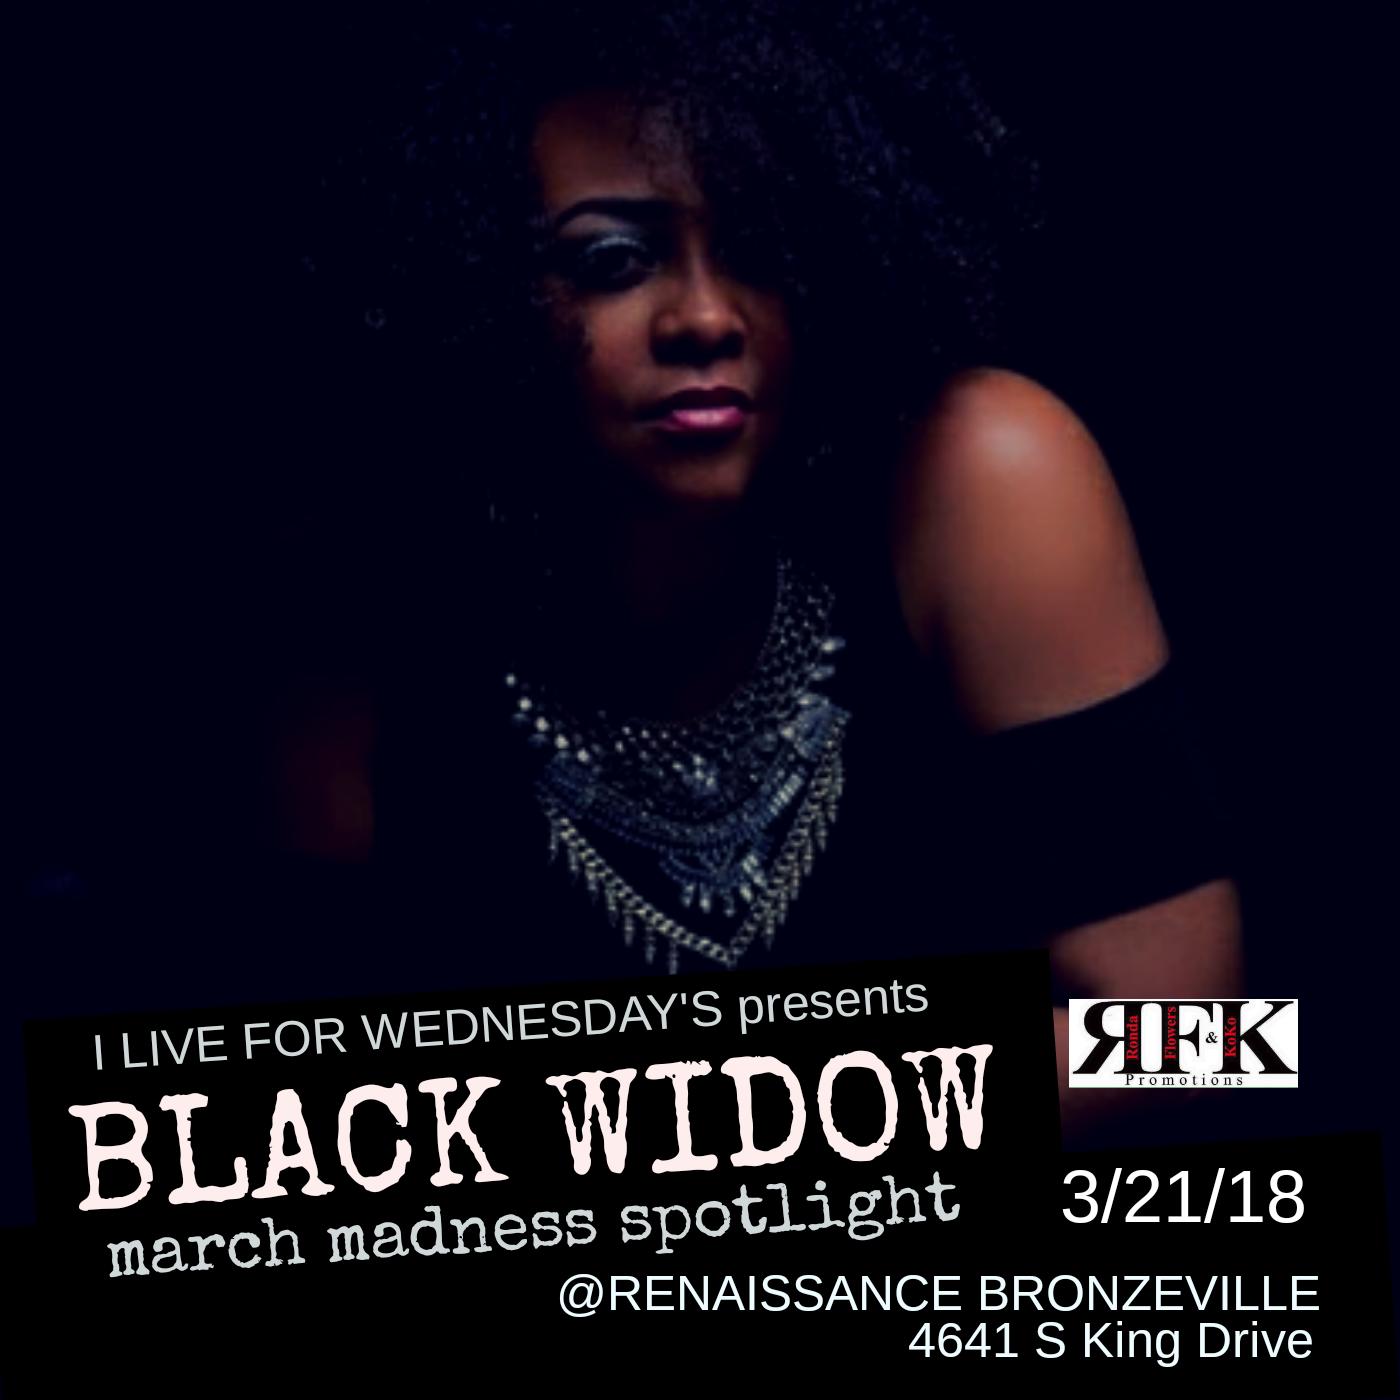 Come Hear Black Widow Live!! - Weds, March 21st at the Renaissance Bronzeville